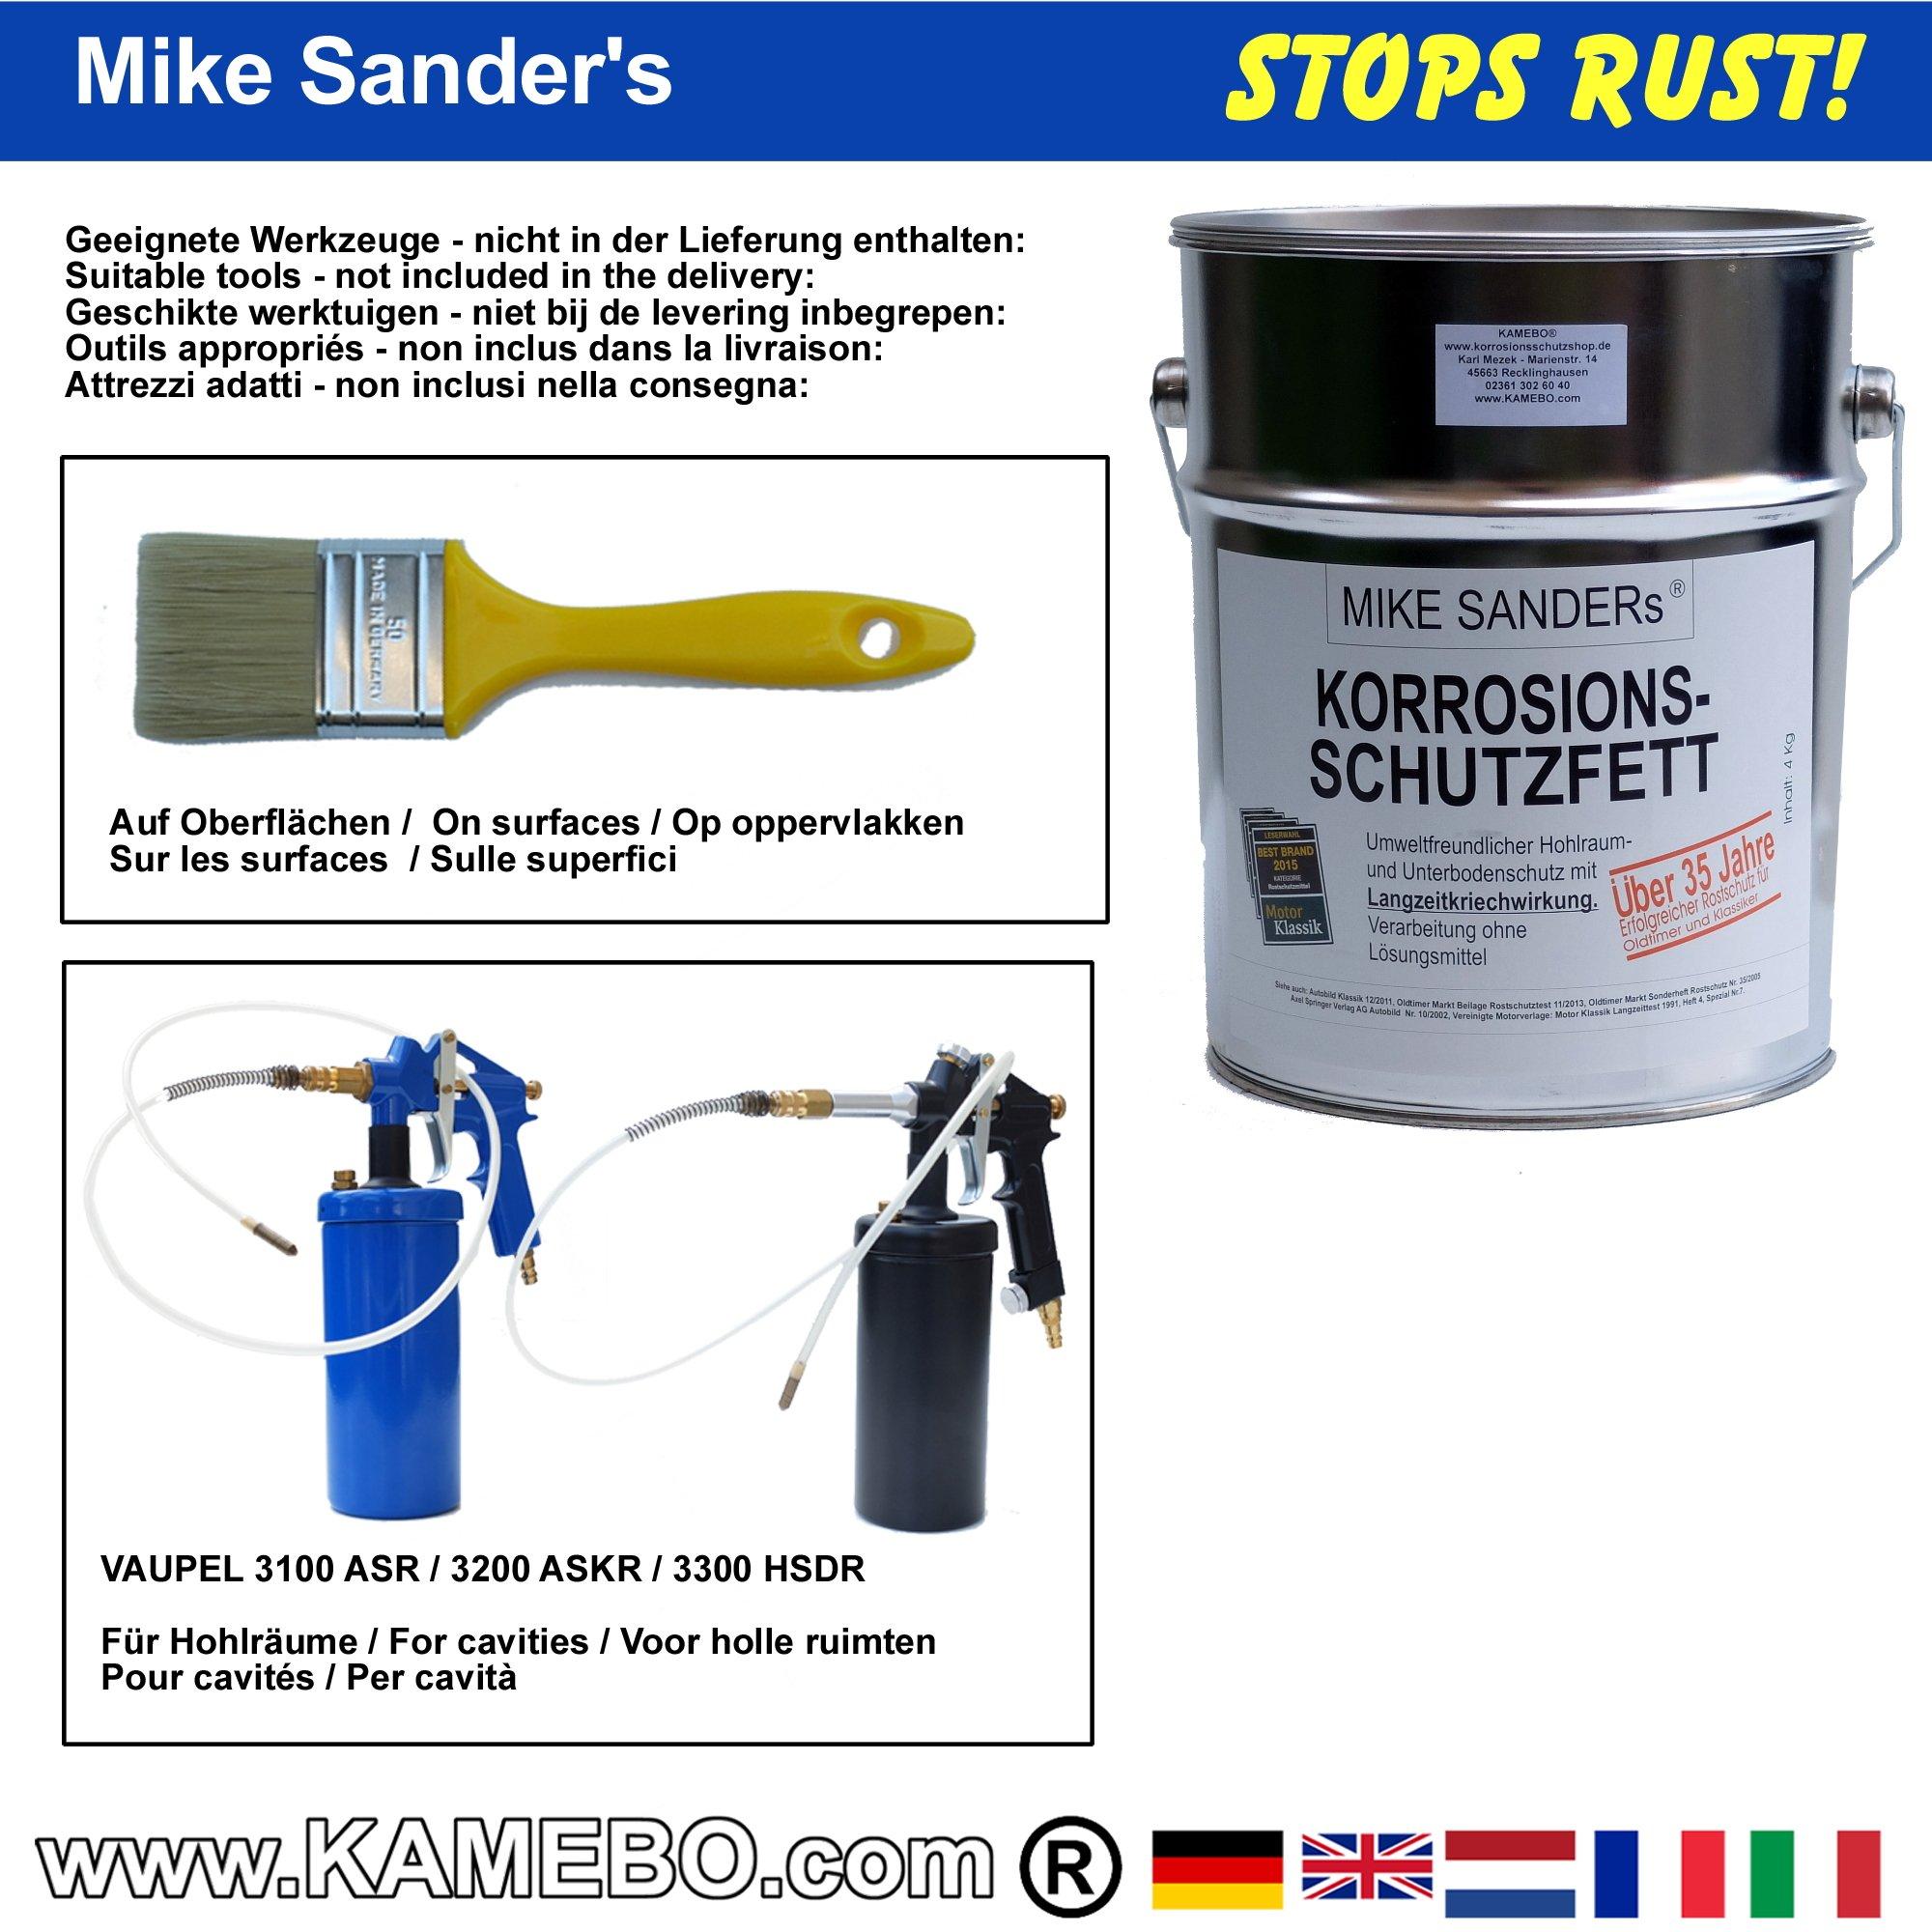 mike sanders korrosionsschutzfett 4 kg eimer kamebo. Black Bedroom Furniture Sets. Home Design Ideas